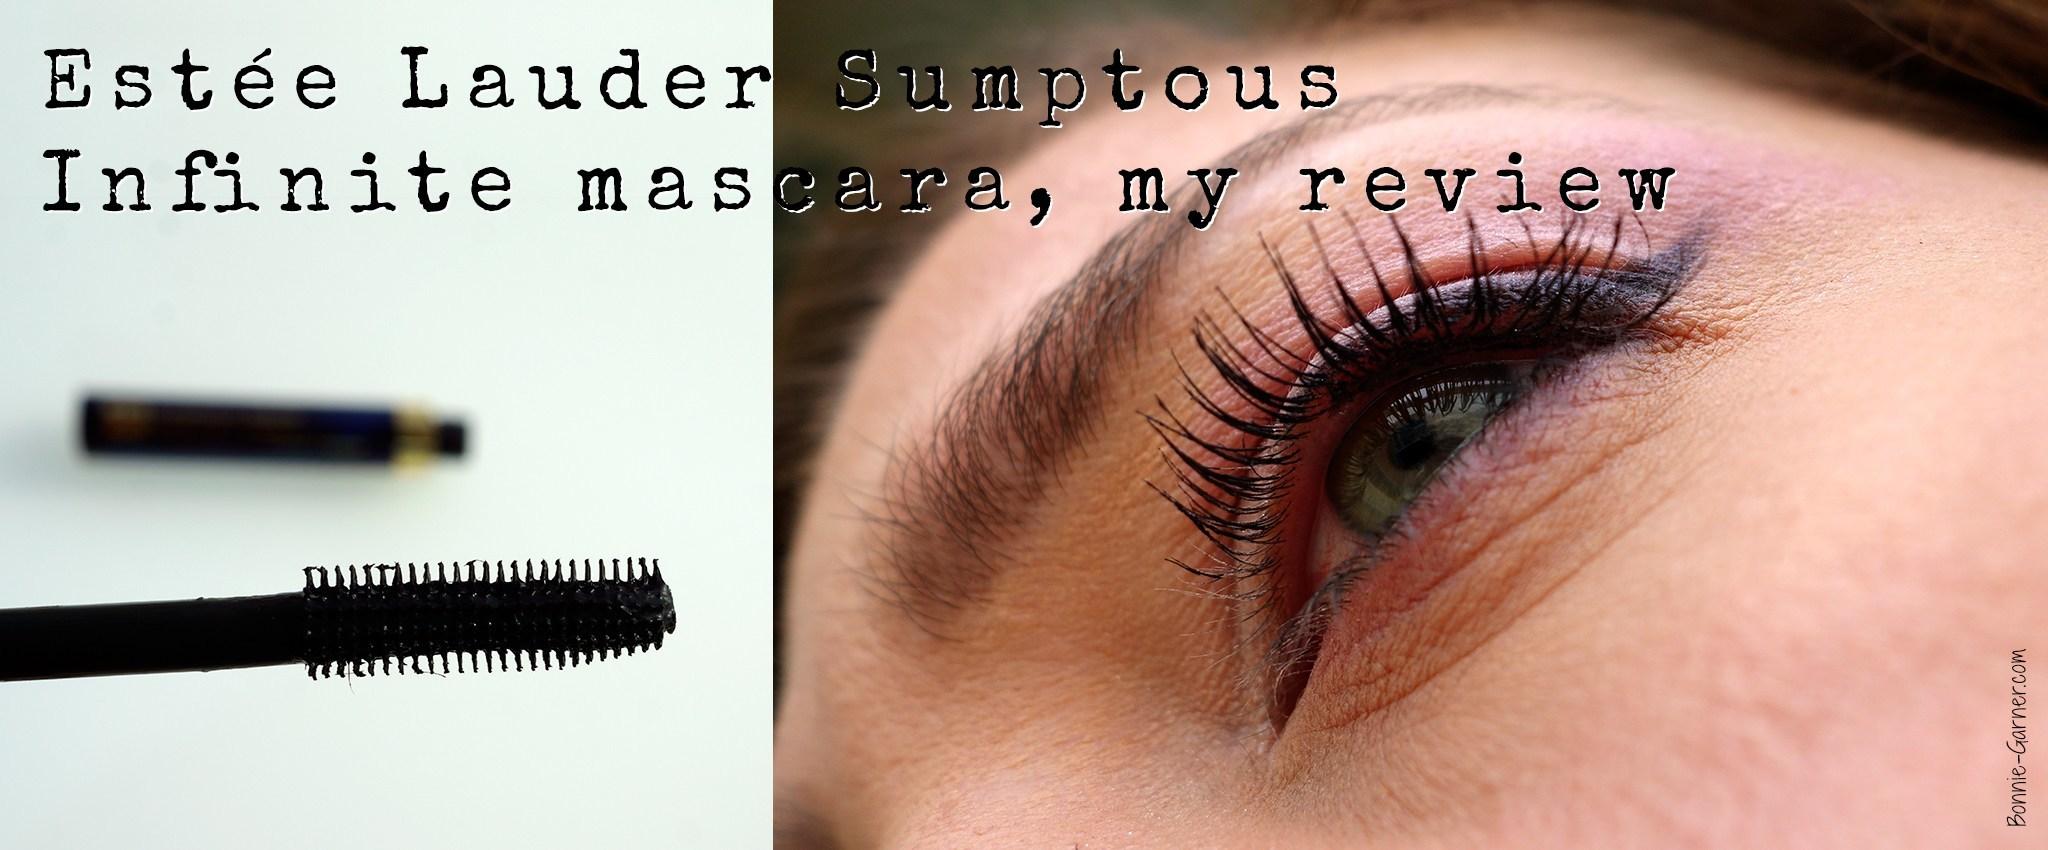 Estée Lauder Sumptous Infinite mascara, my review